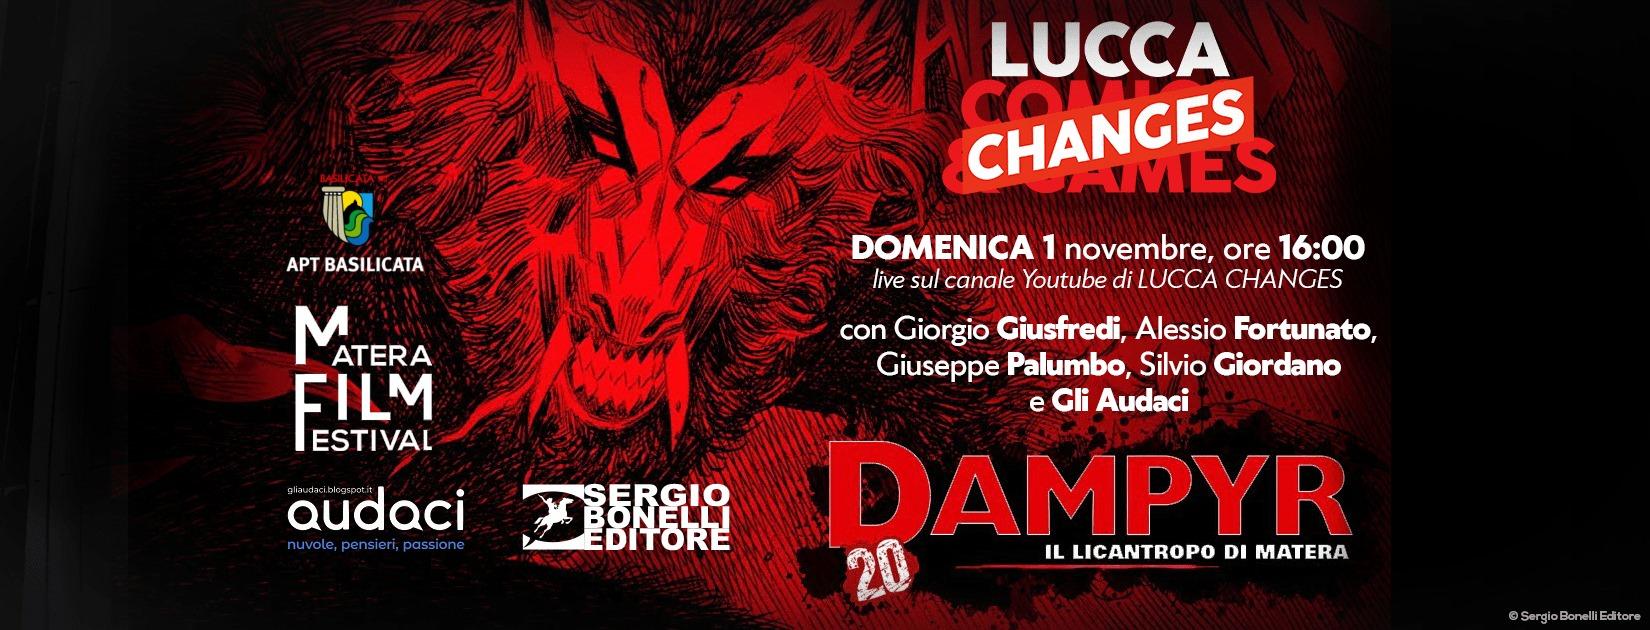 Lucca Comics&Games Changes 2020